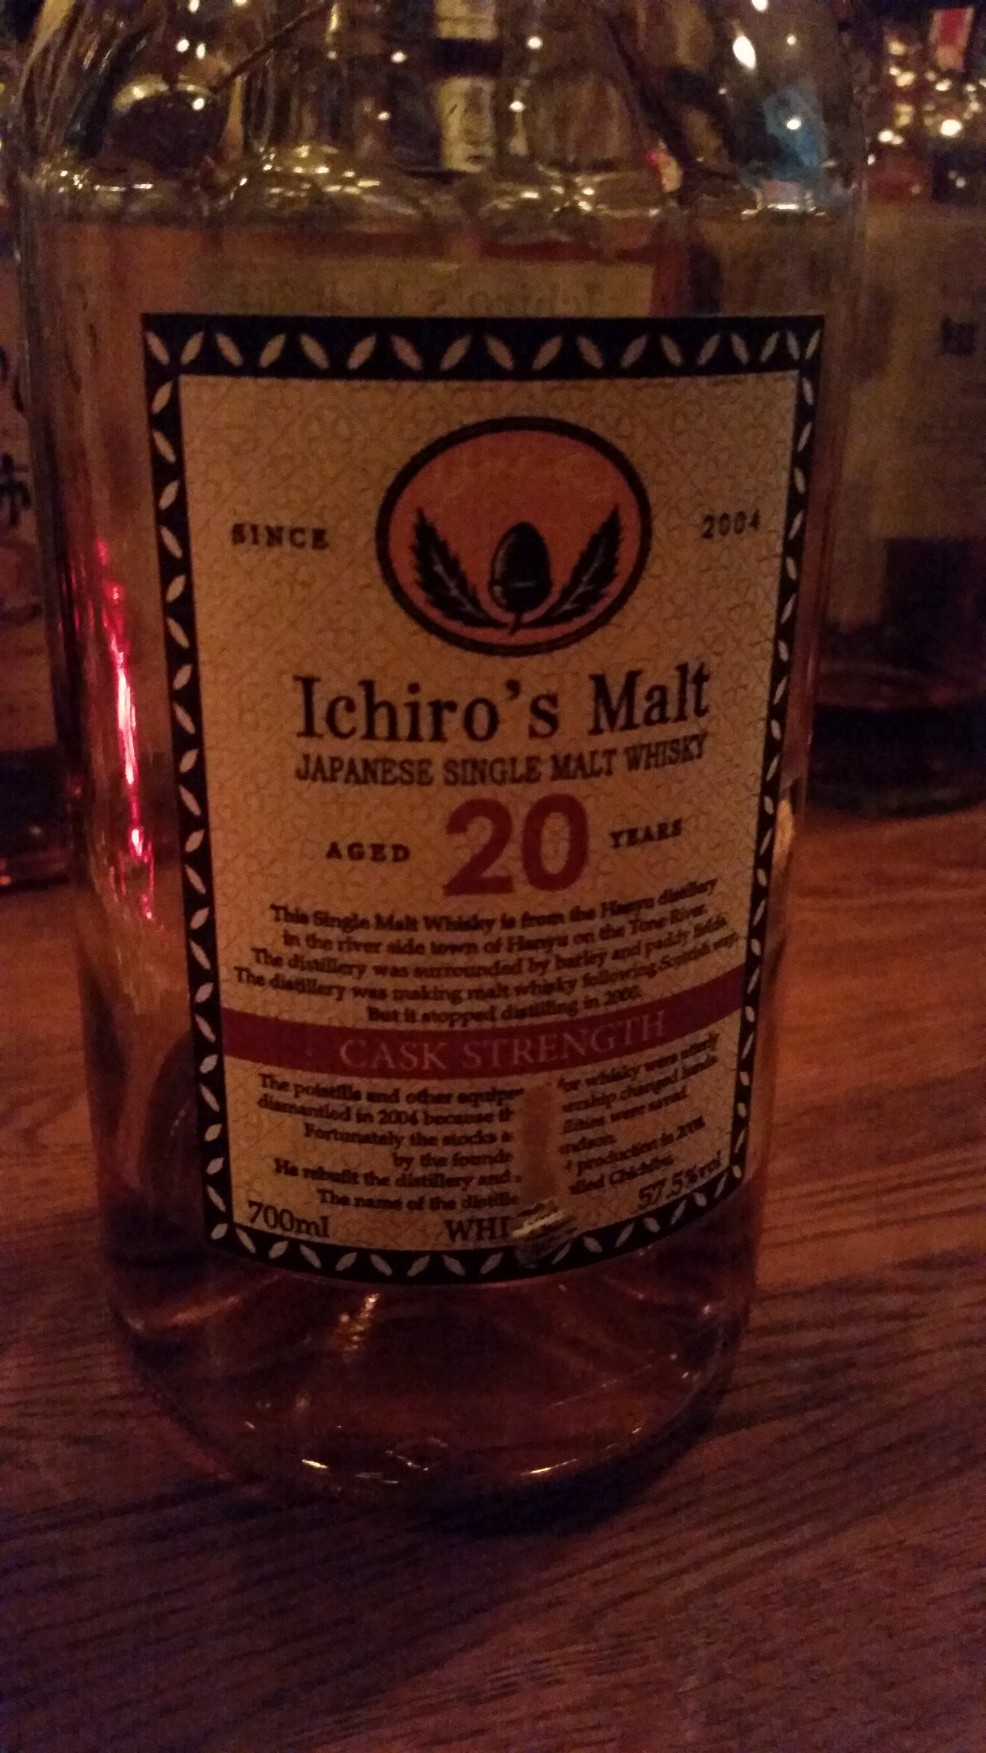 Ichiro's Malt Hanyu 20yr Cask Strength Release 3